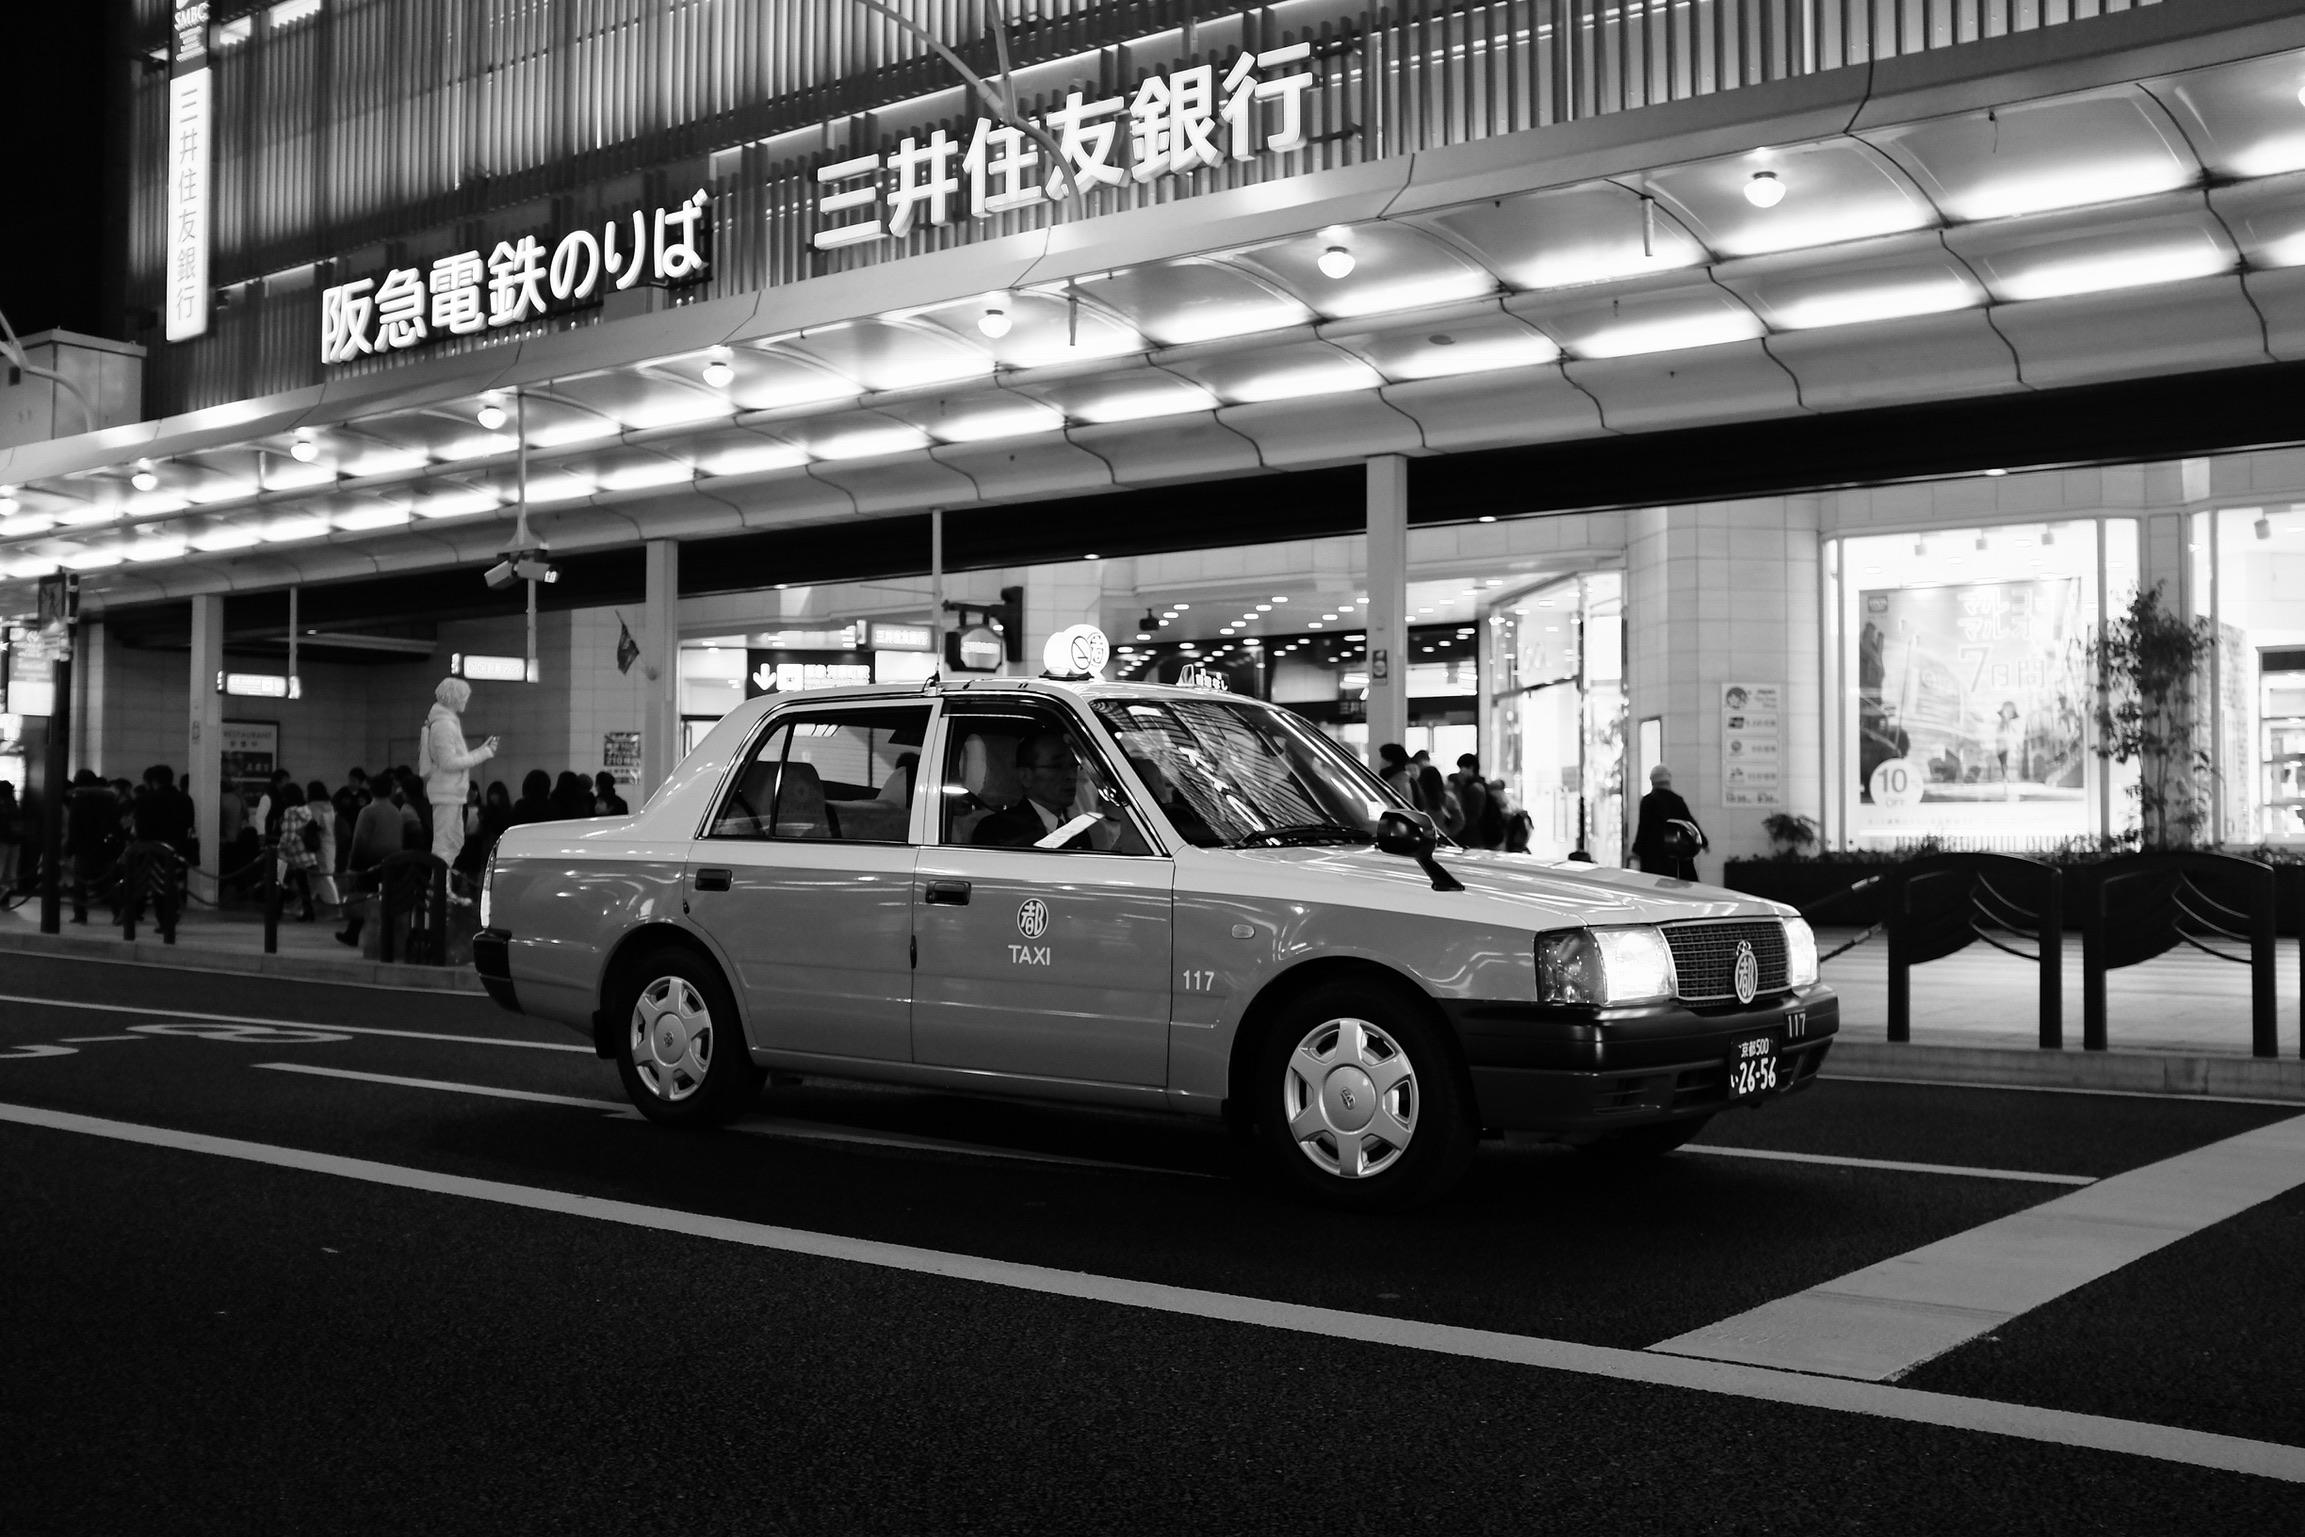 Fuji x100s - Kyoto by night